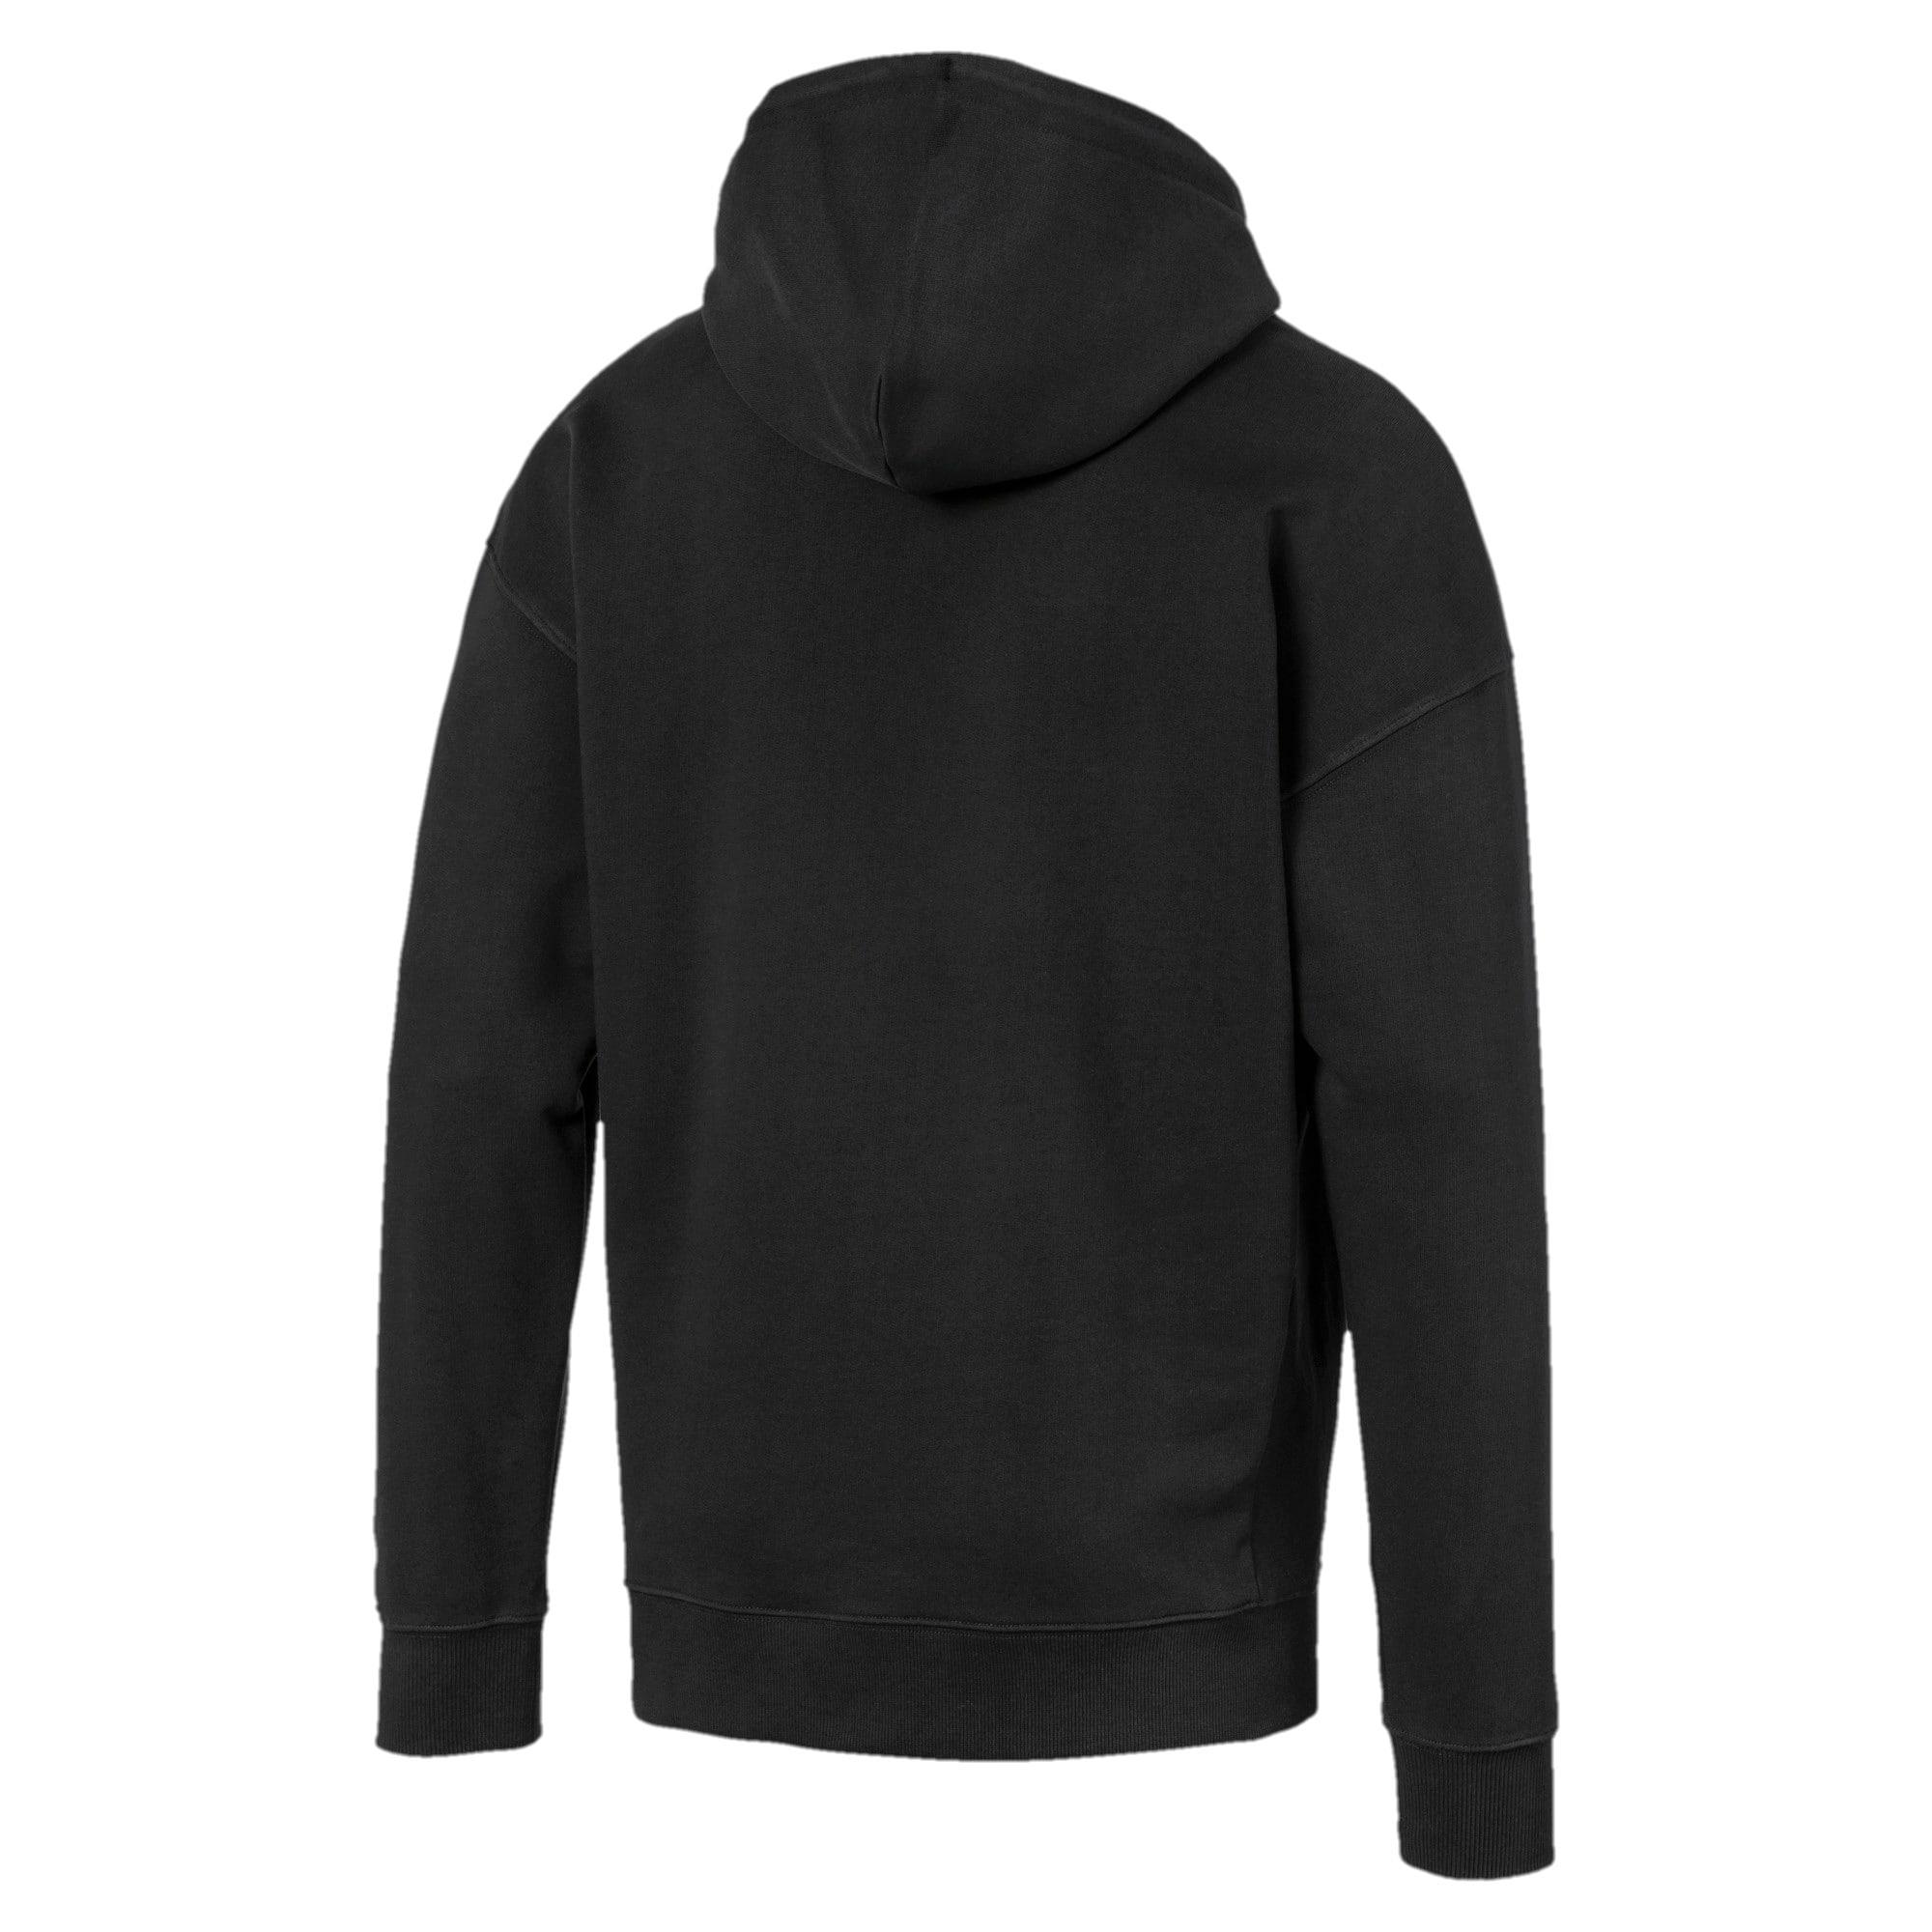 Miniatura 5 de Chaqueta con capucha para hombre OG, Puma Black, mediano